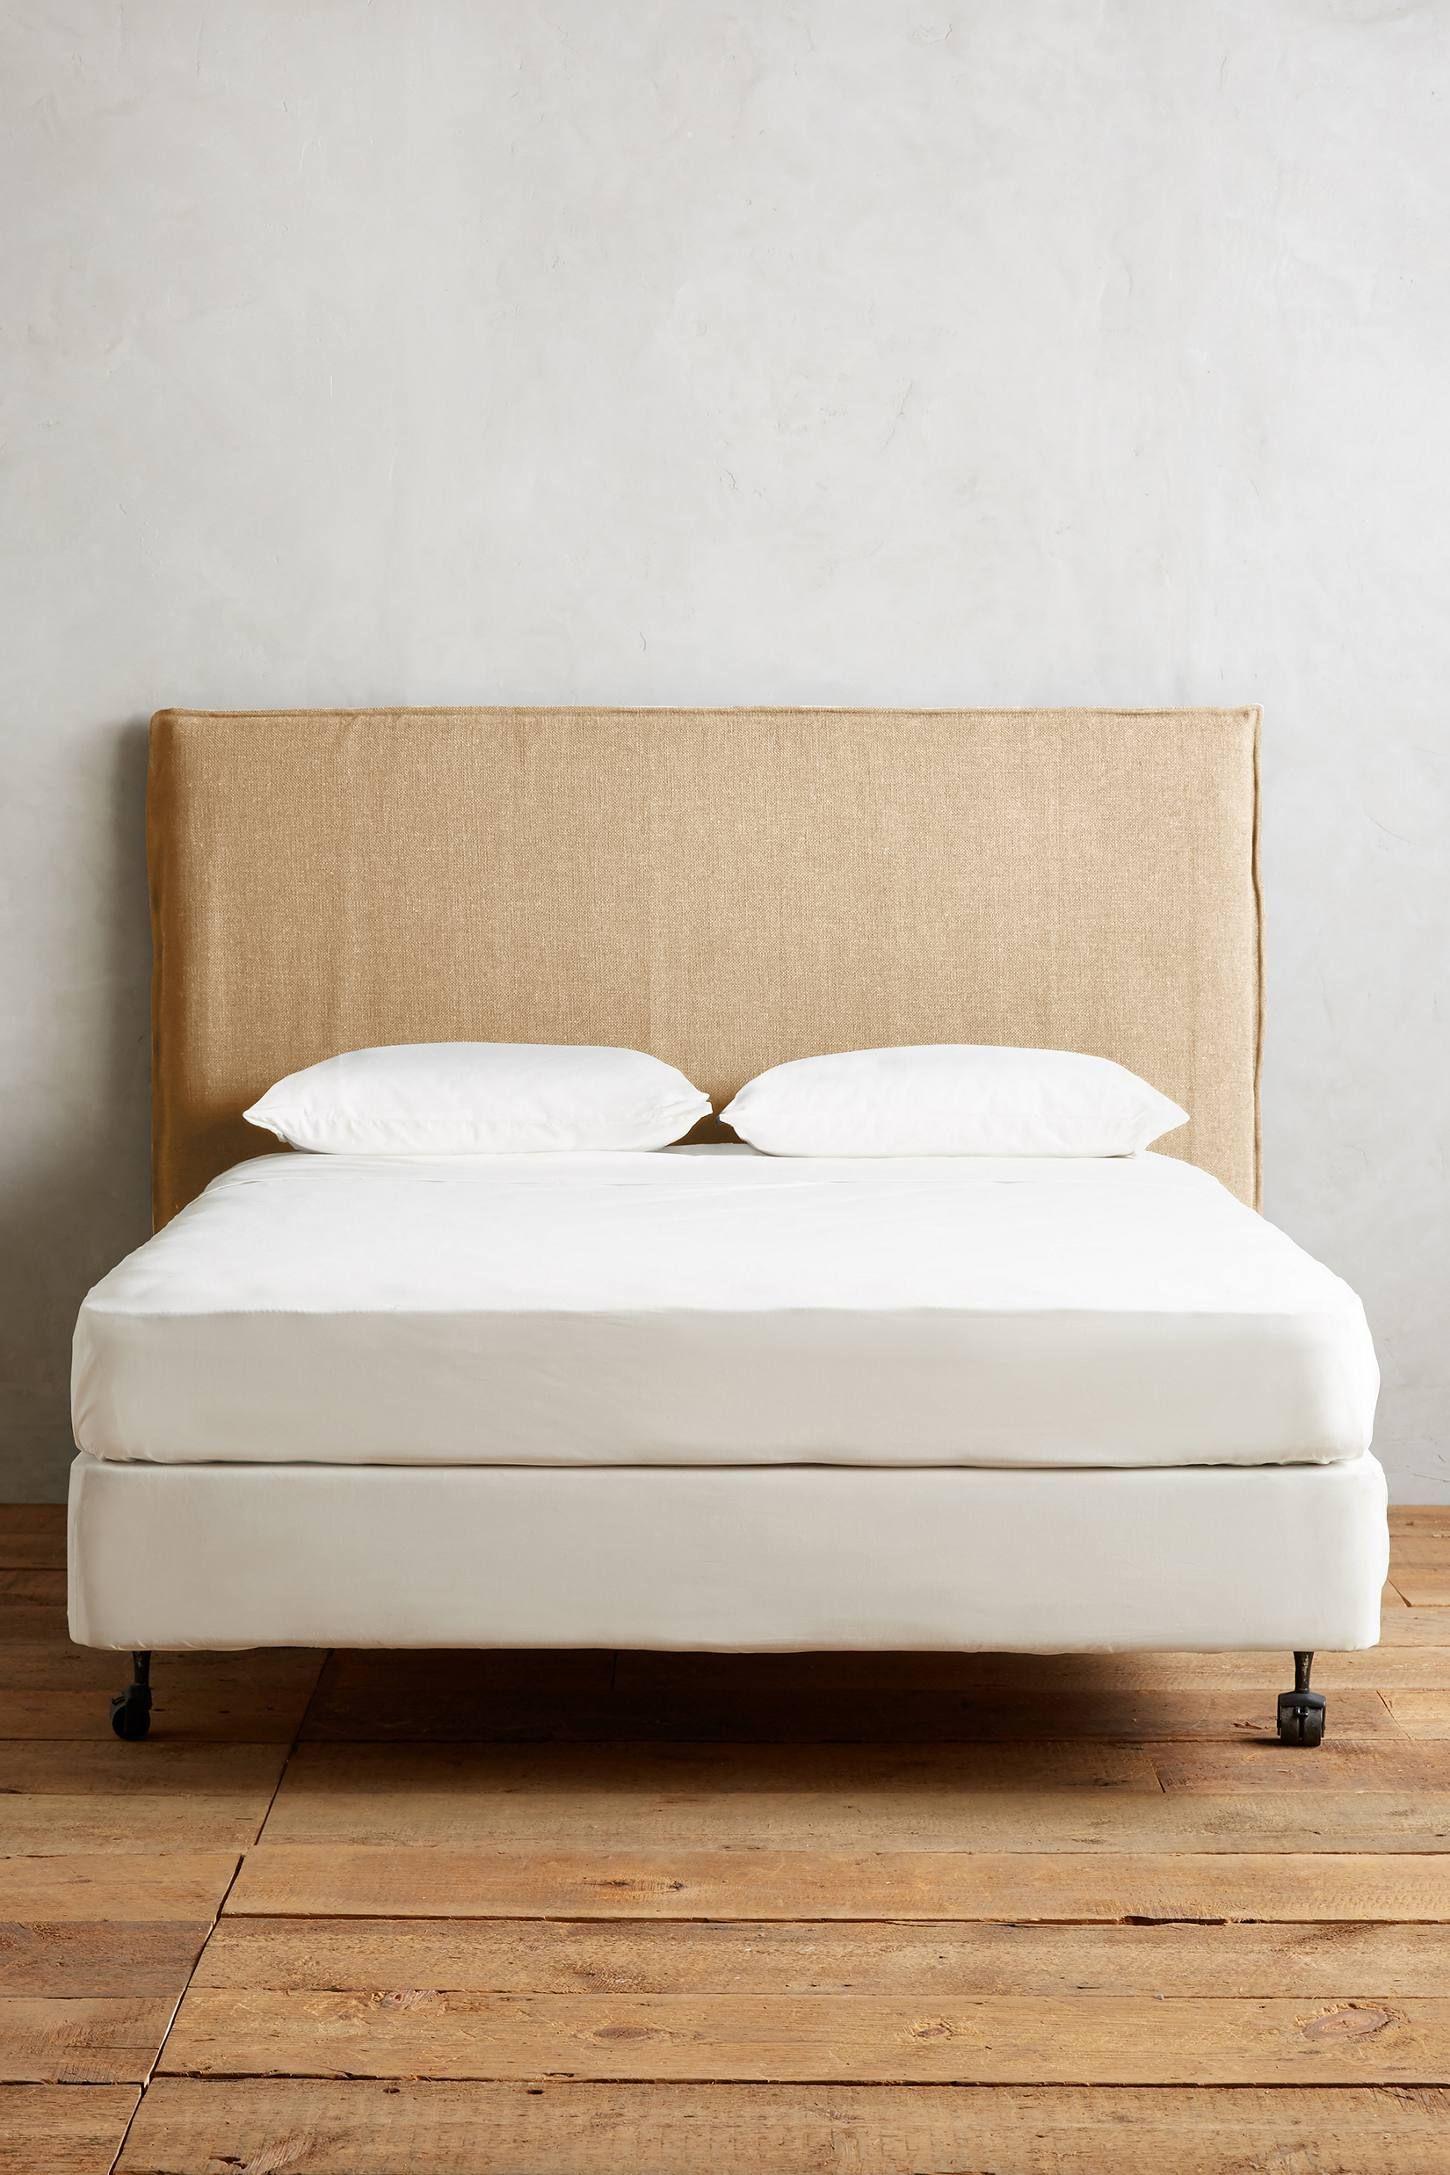 Adjustable Bed Frame Adjustable bed frame, Slipcovers